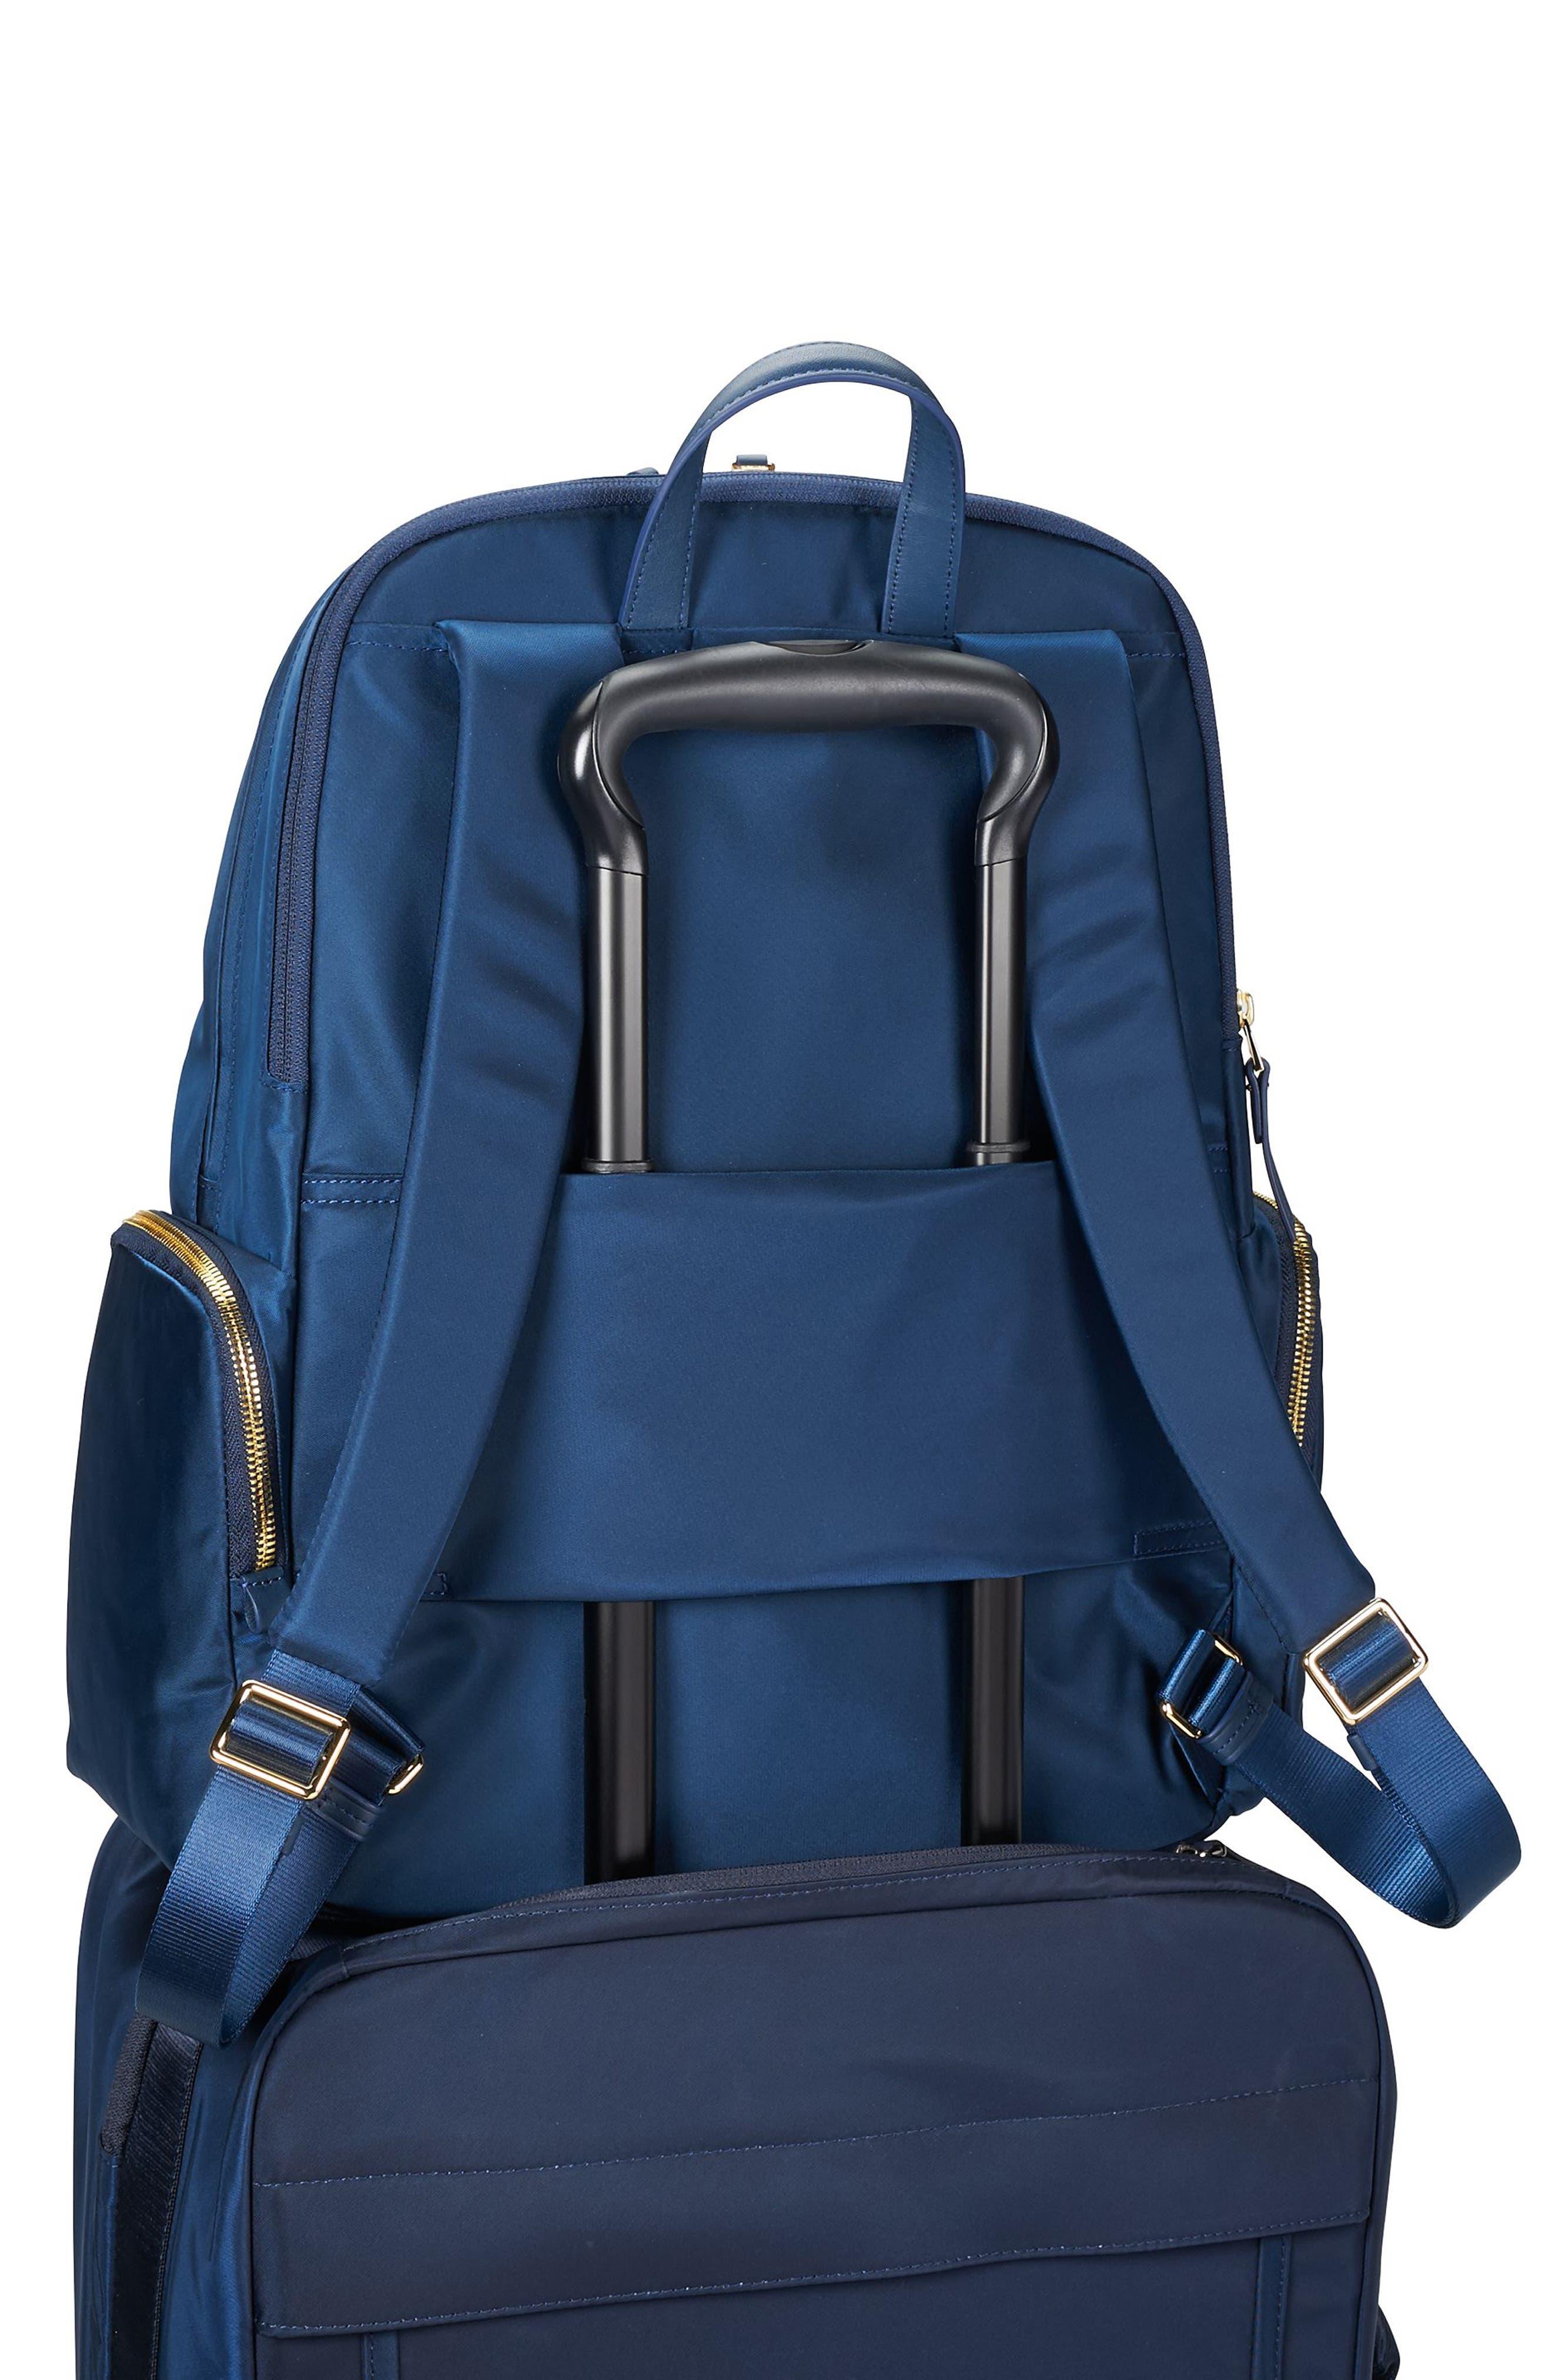 Calais Nylon 15-Inch Computer Commuter Backpack,                             Alternate thumbnail 26, color,